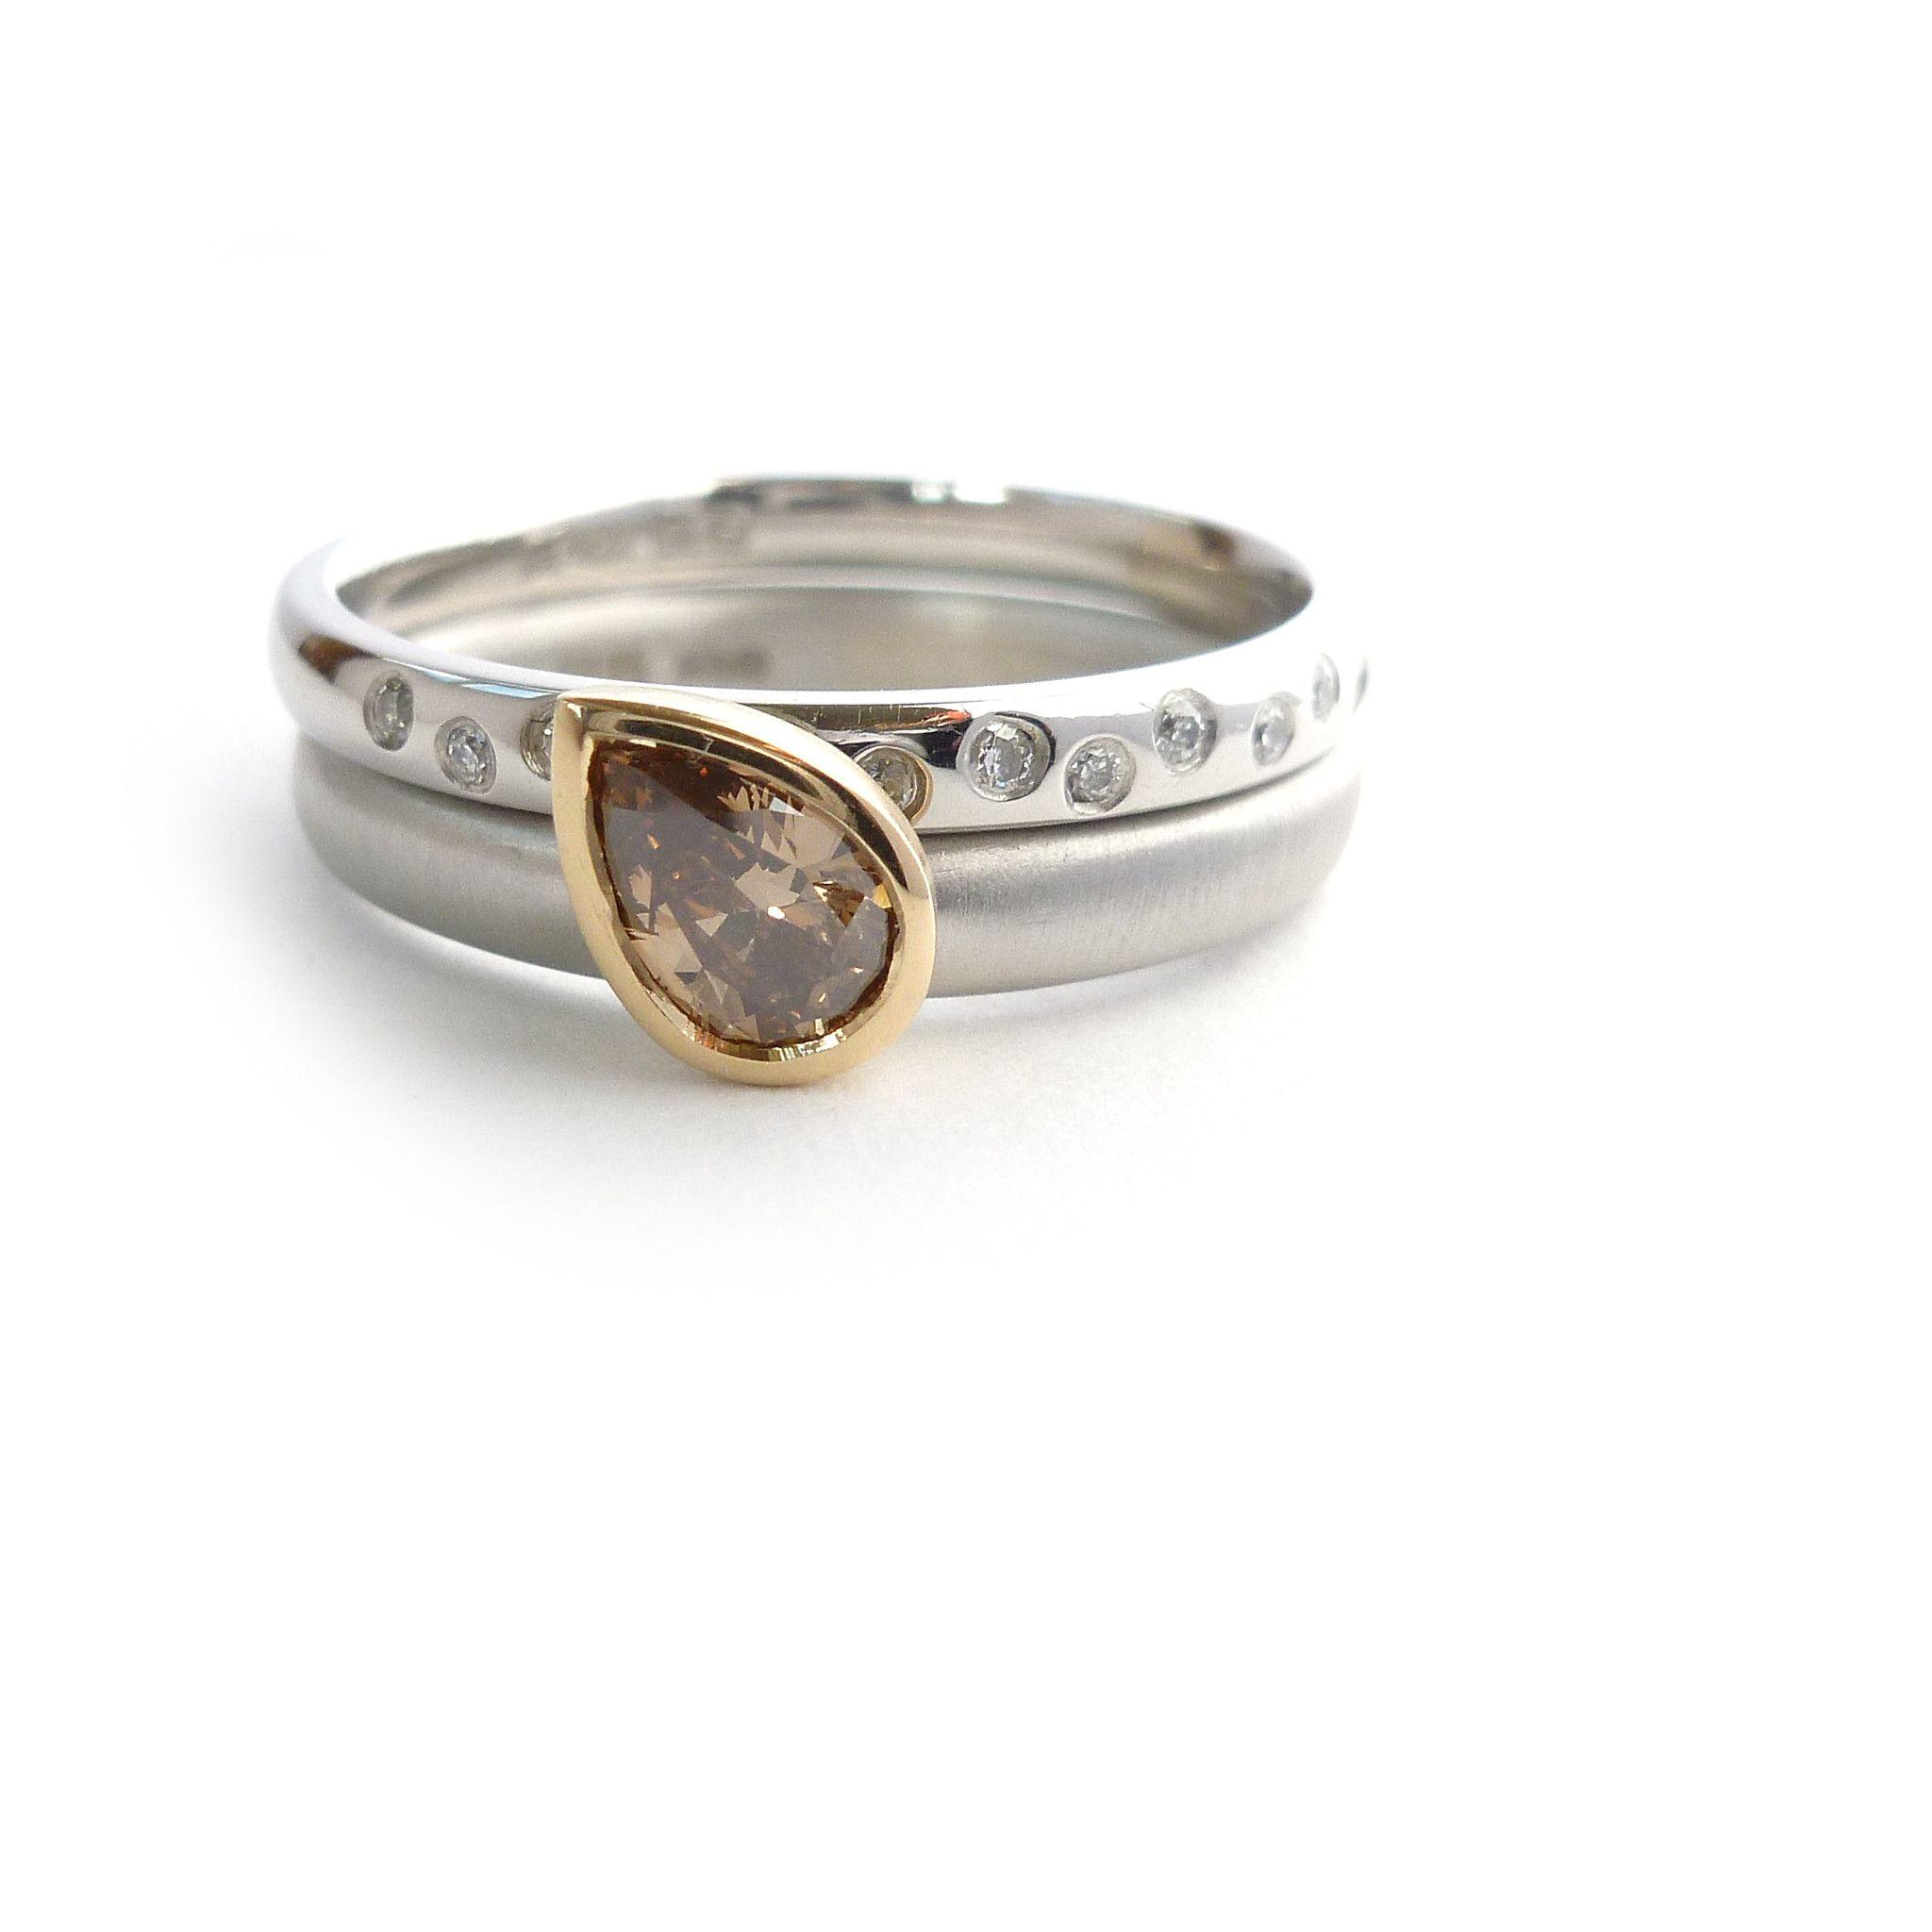 d133d5c6f Platinum and Cognac Diamond Ring   Fun Stuff   Pinterest   Rings ...